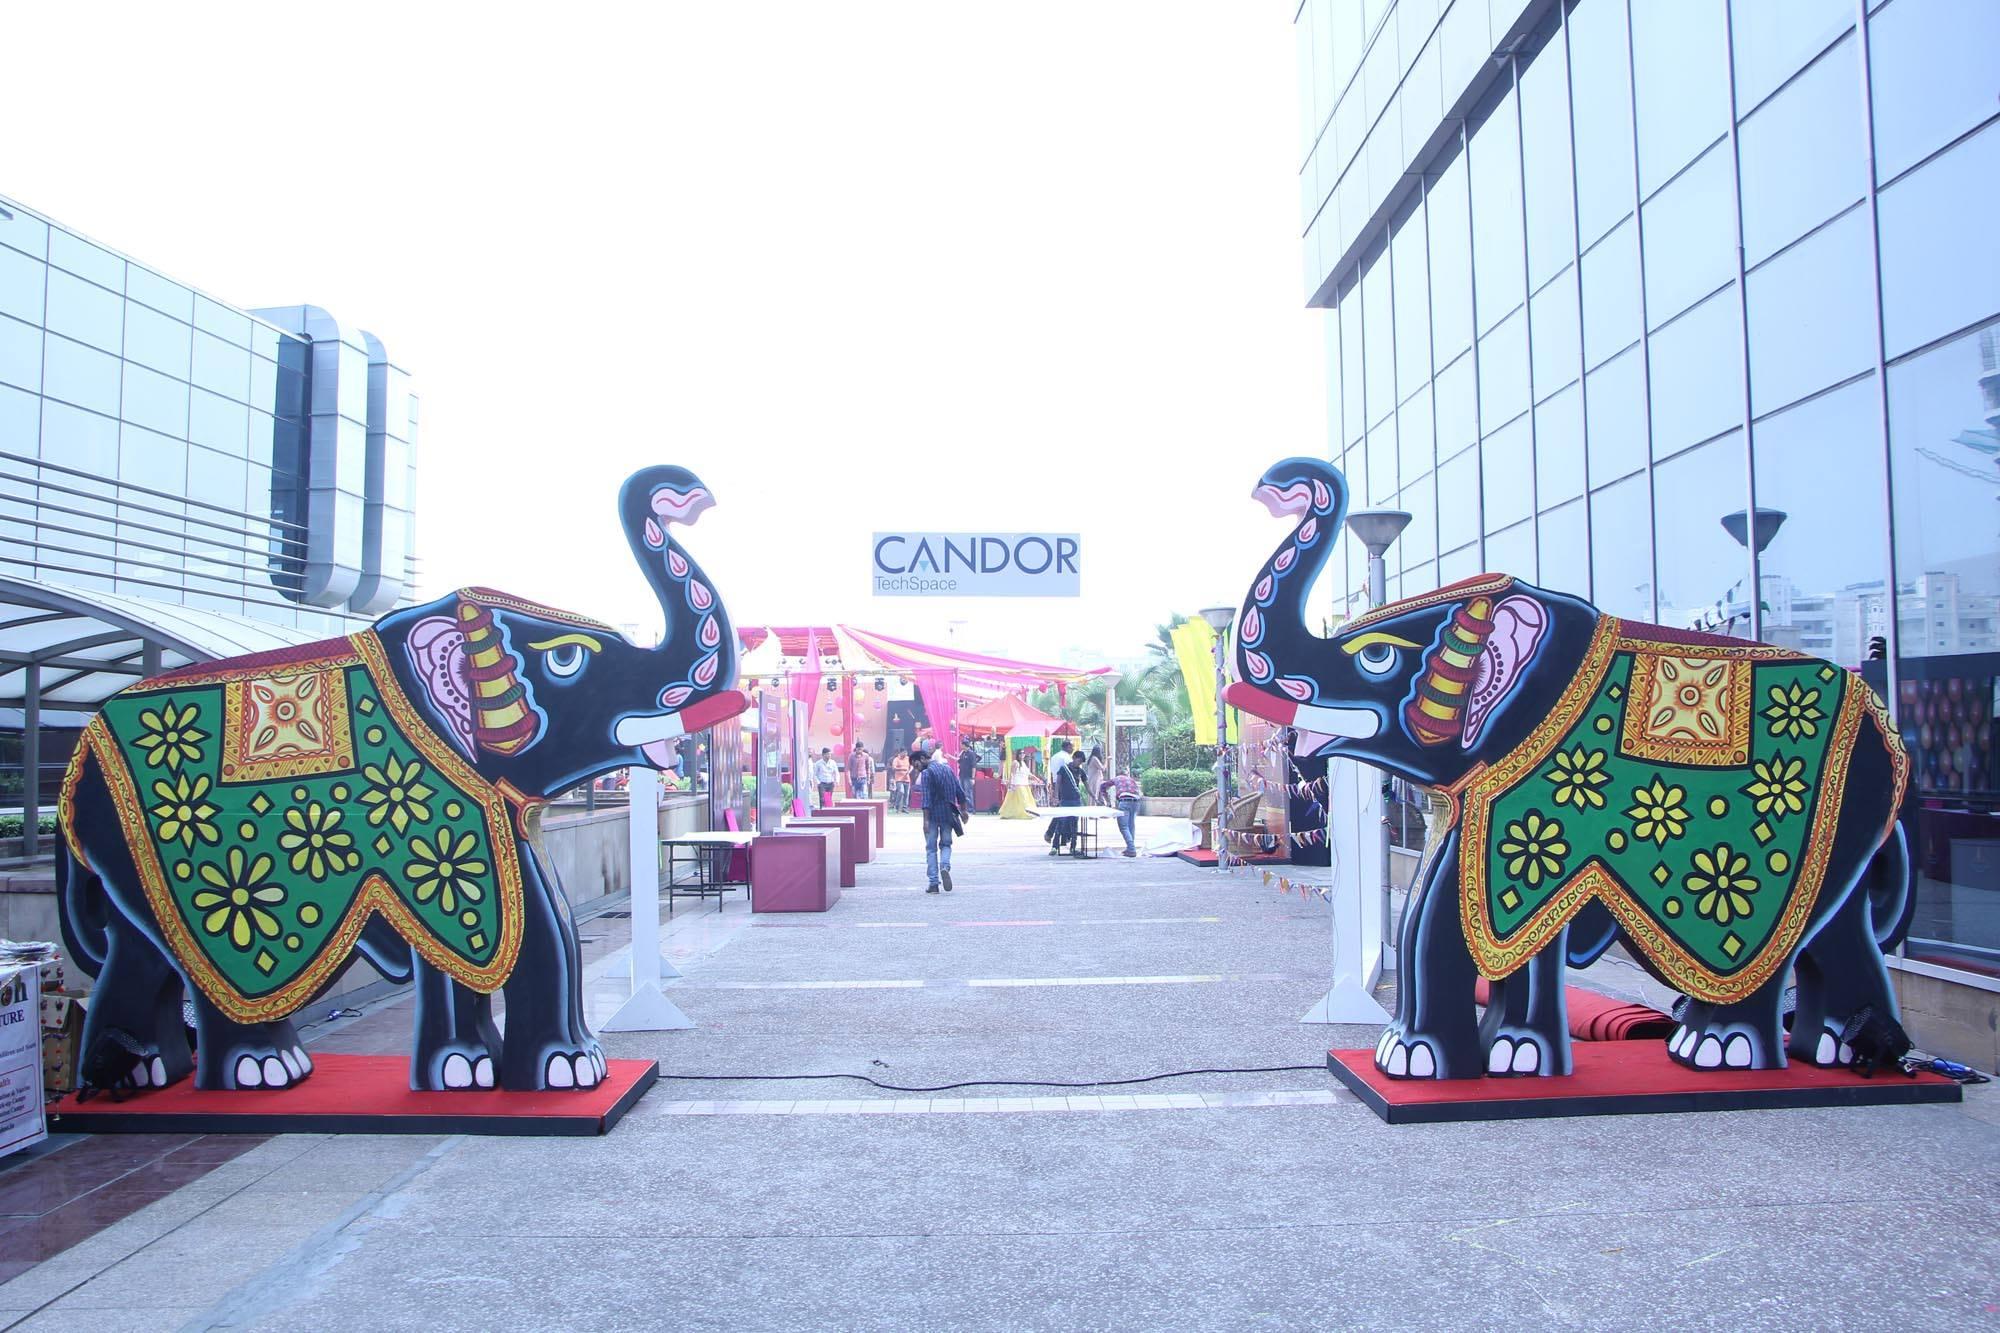 candor-diwali-Noida-62-9.jpg